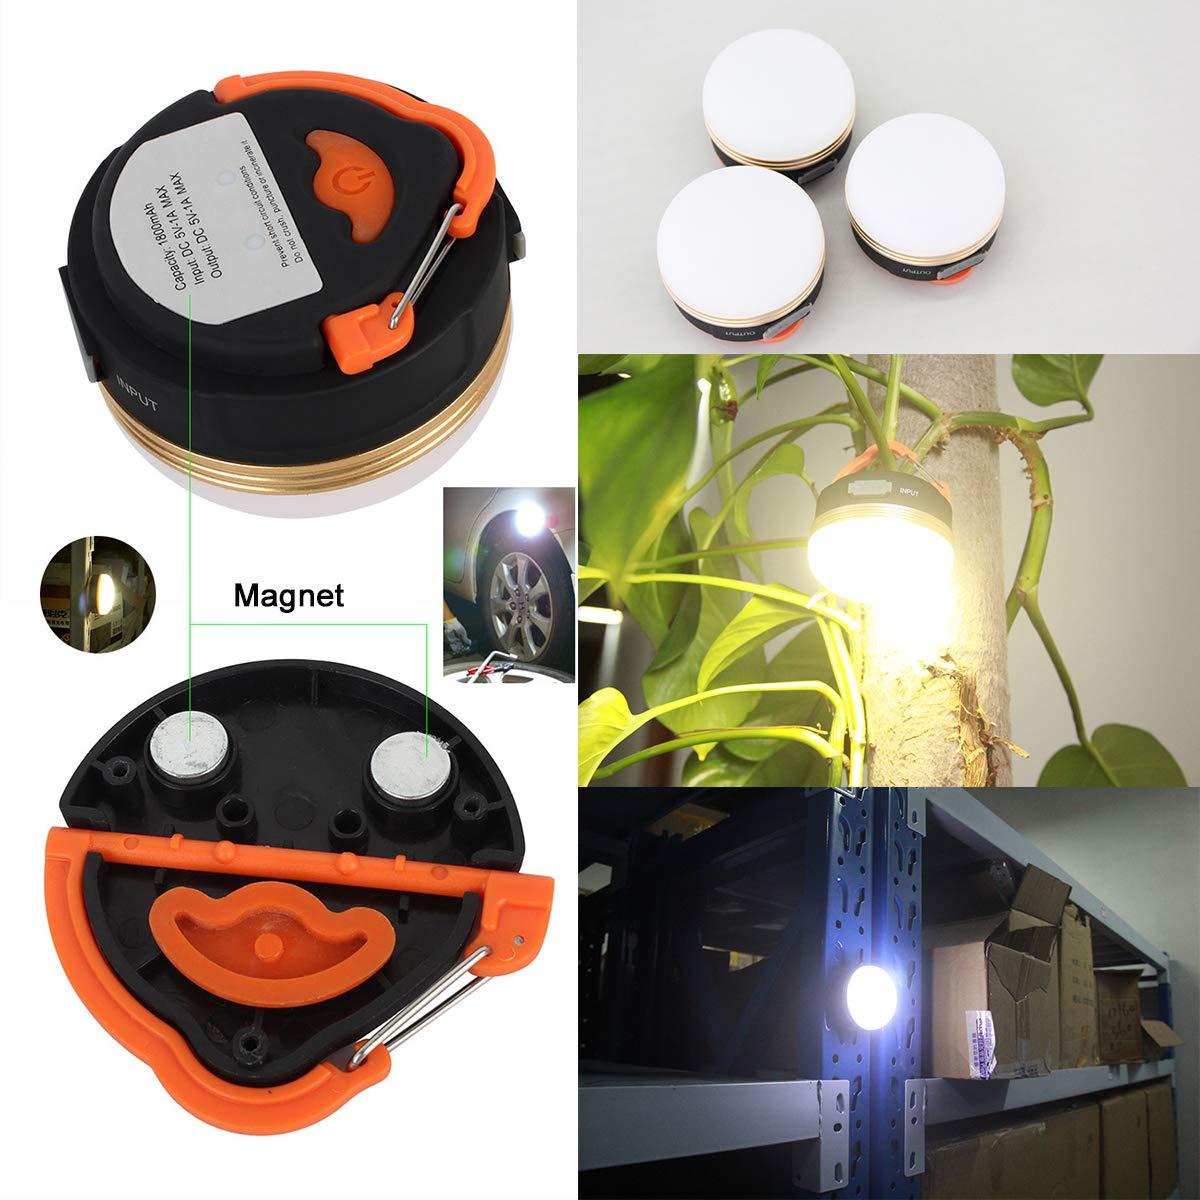 PAGAO USB Camp lumi/ère Camping /équipements de Sport Kits Lanterne Lampe Torche Mini Camp lumi/ère